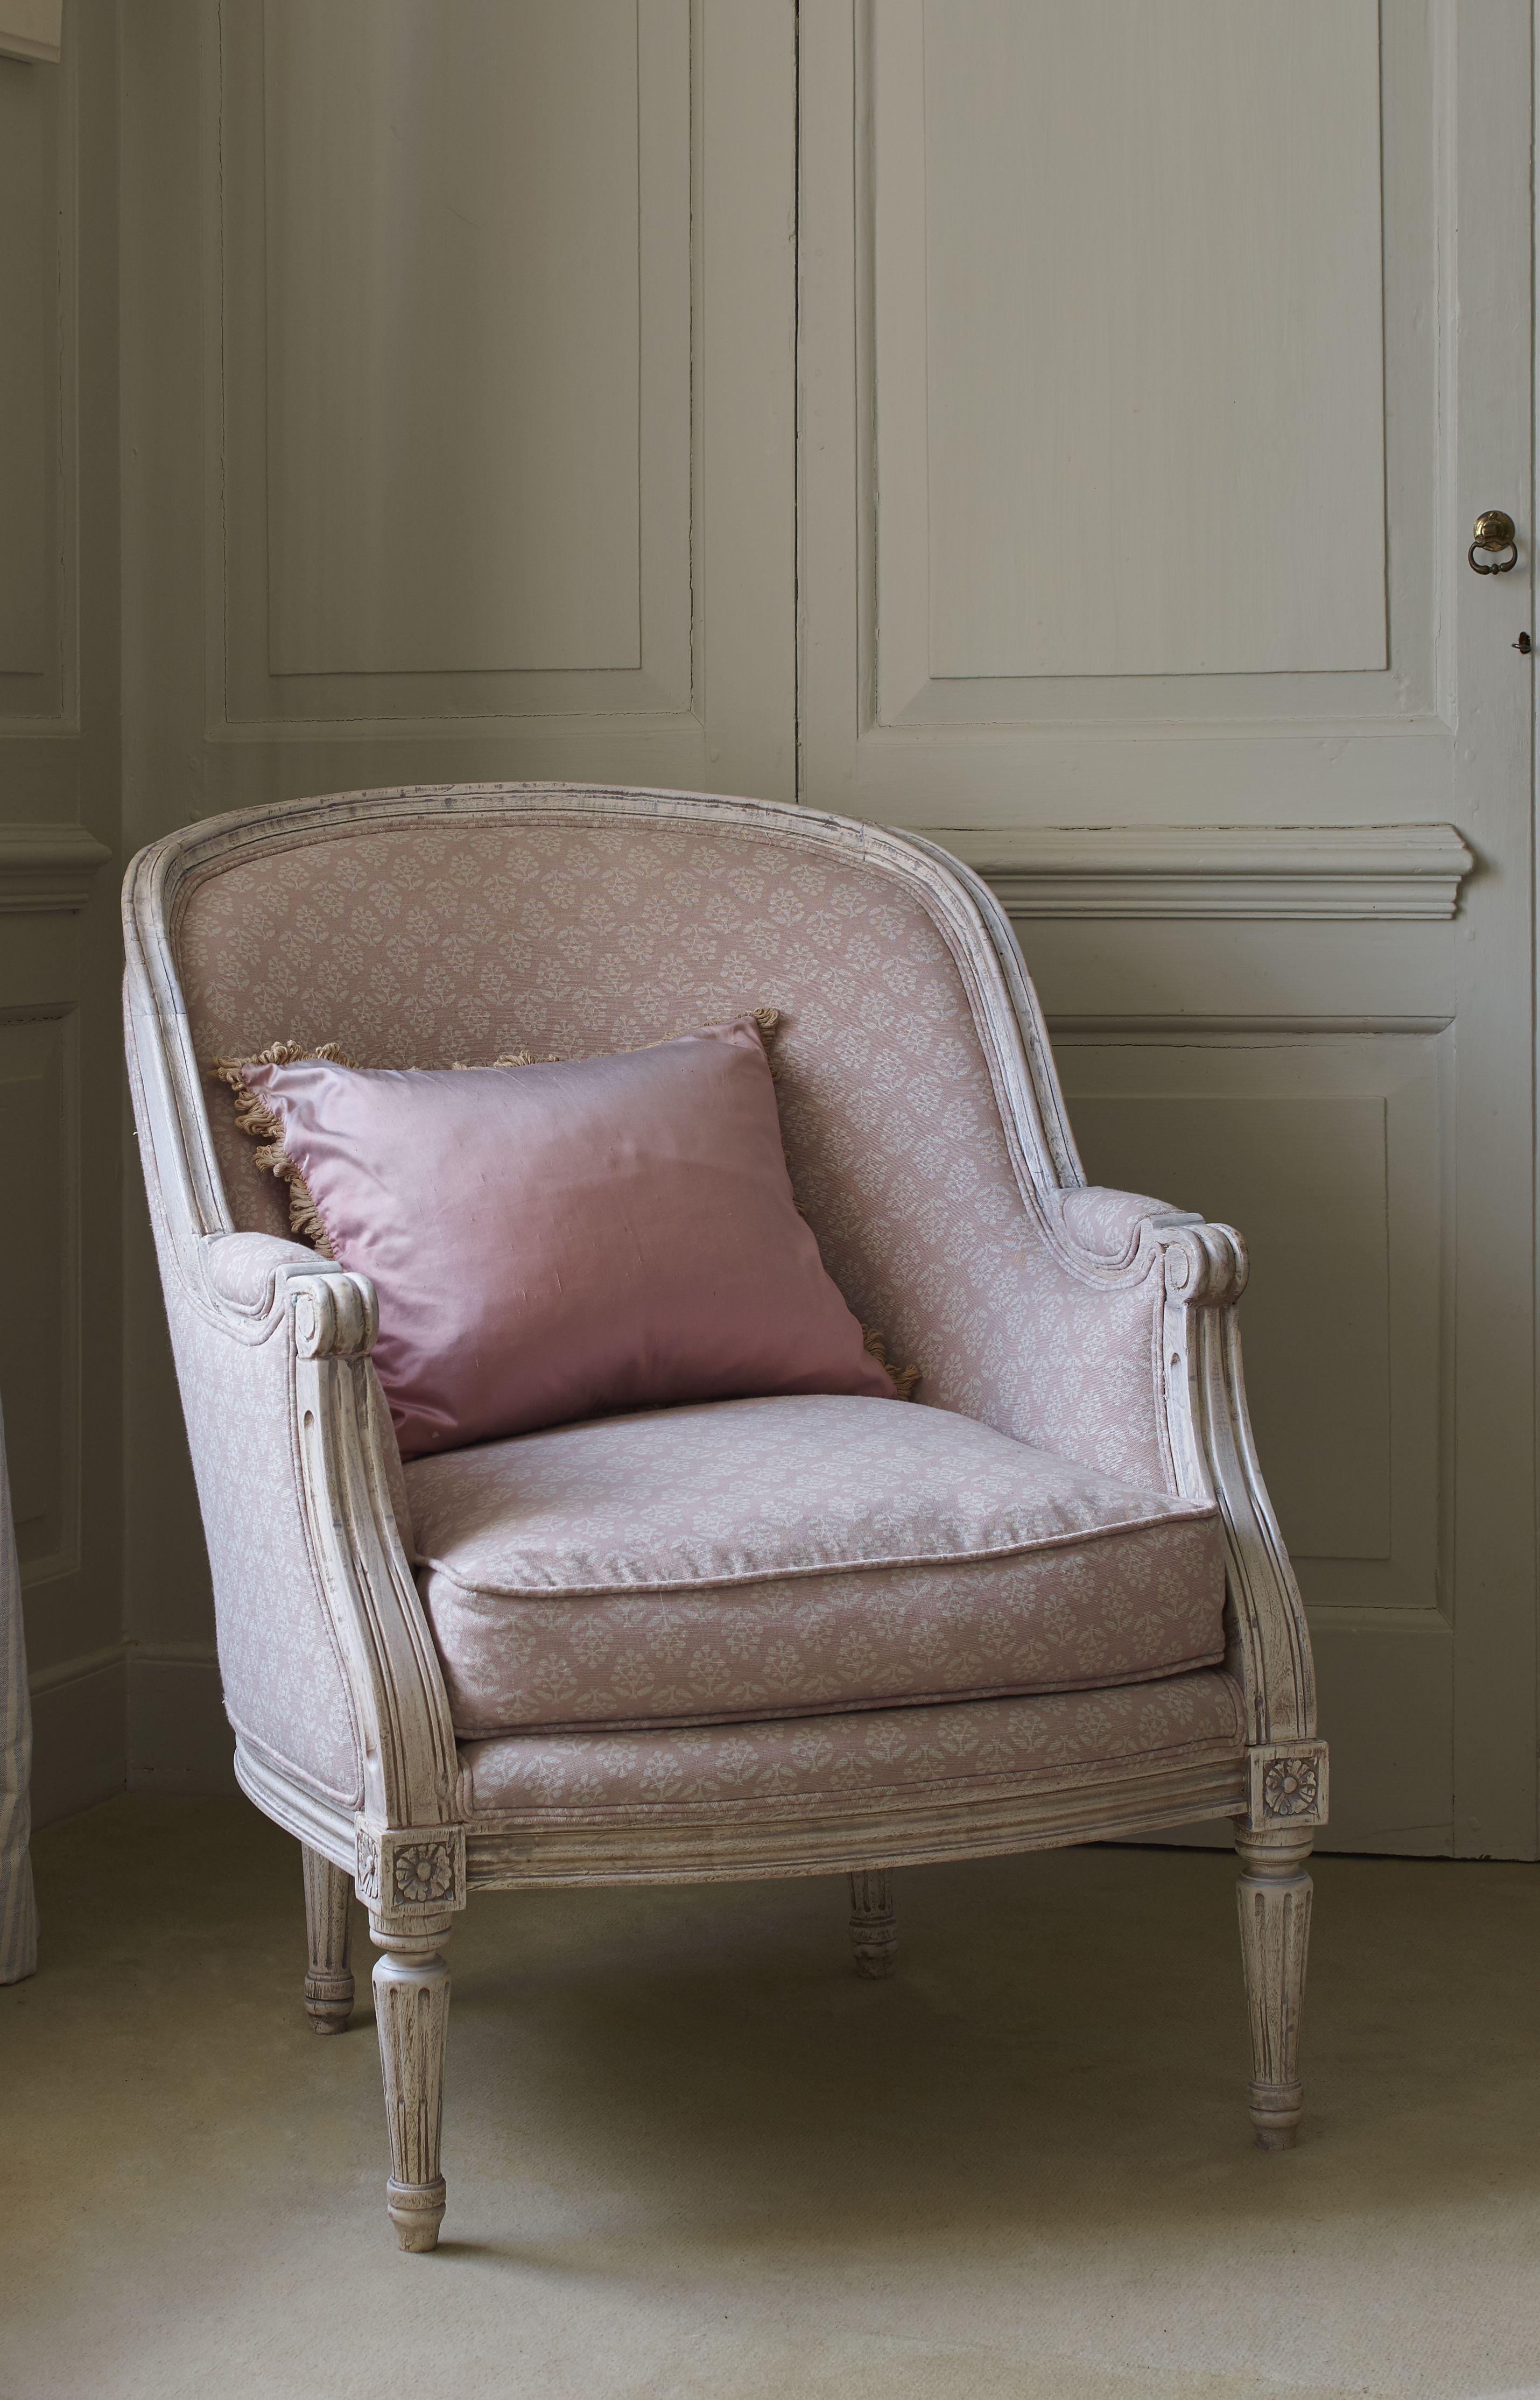 Begere chair Farmhouse Furniture Pinterest